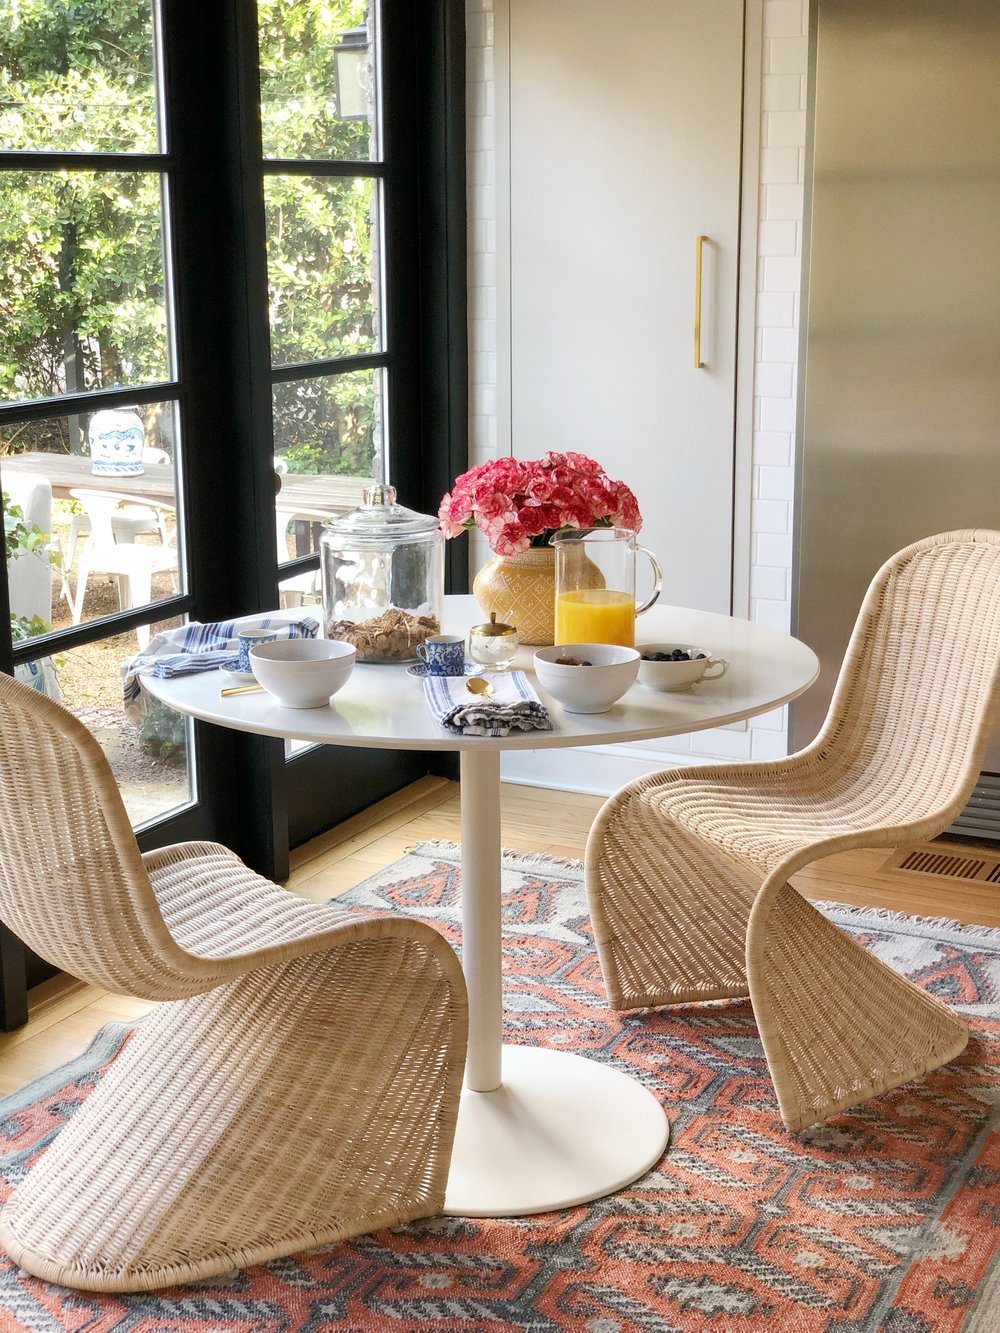 610bd3a43e47 set of 2 rattan dining chairs , similar flatweave rug , glass jar , fridge ,